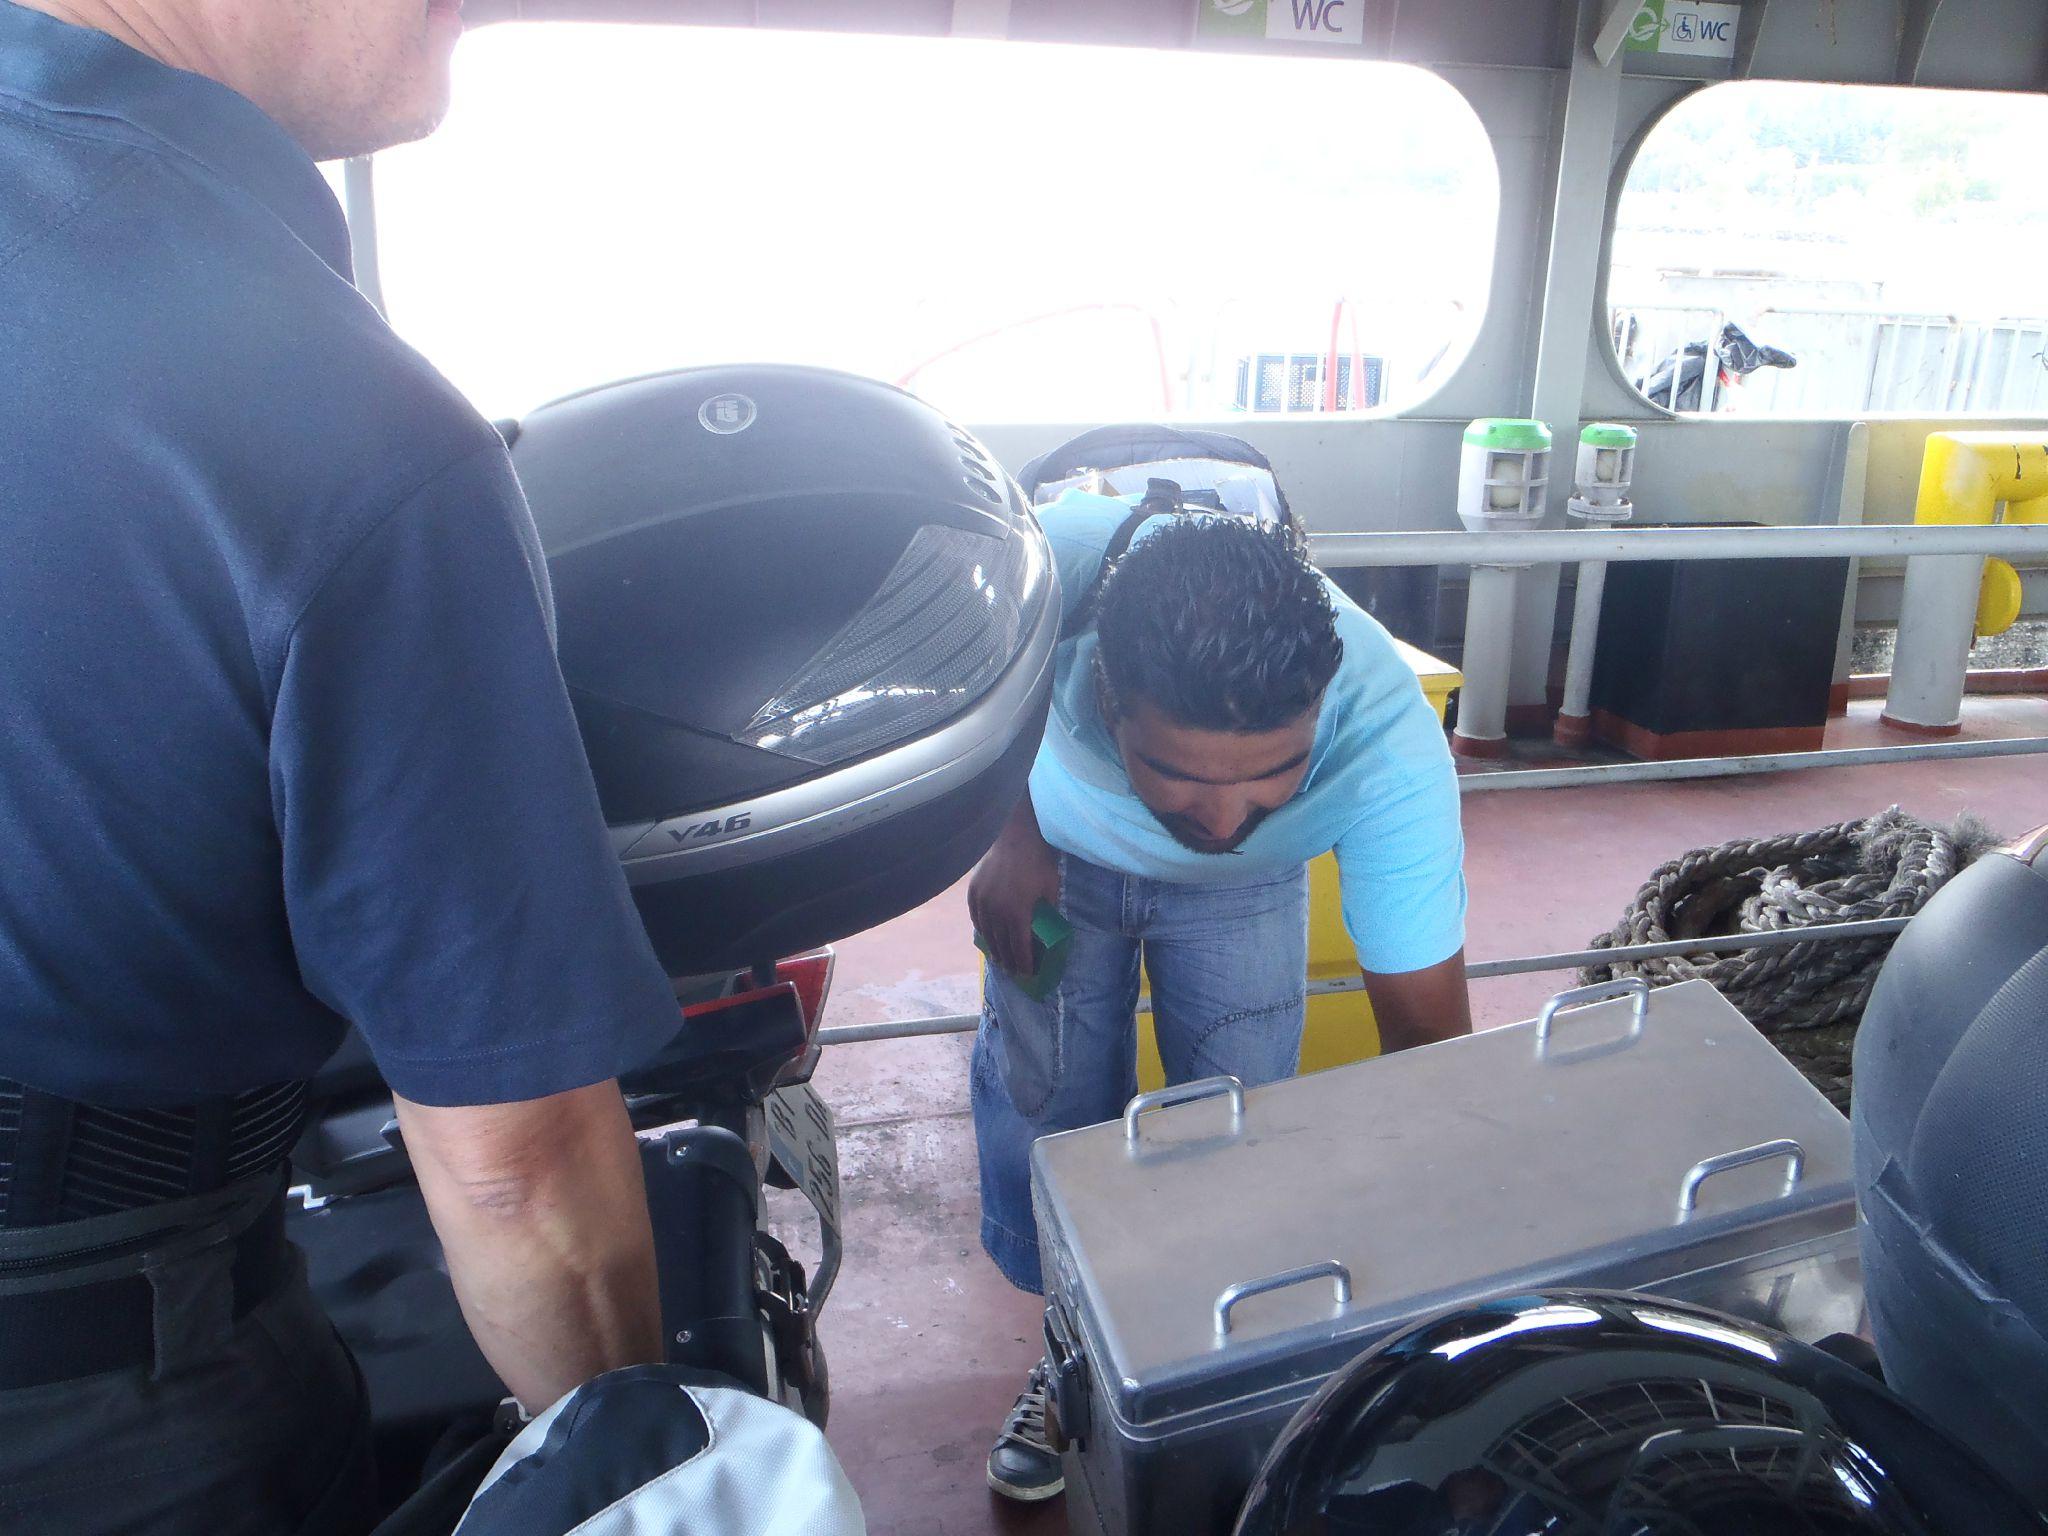 turquie : sur le ferry traversée de marmara on admire l''iti deja parcouru